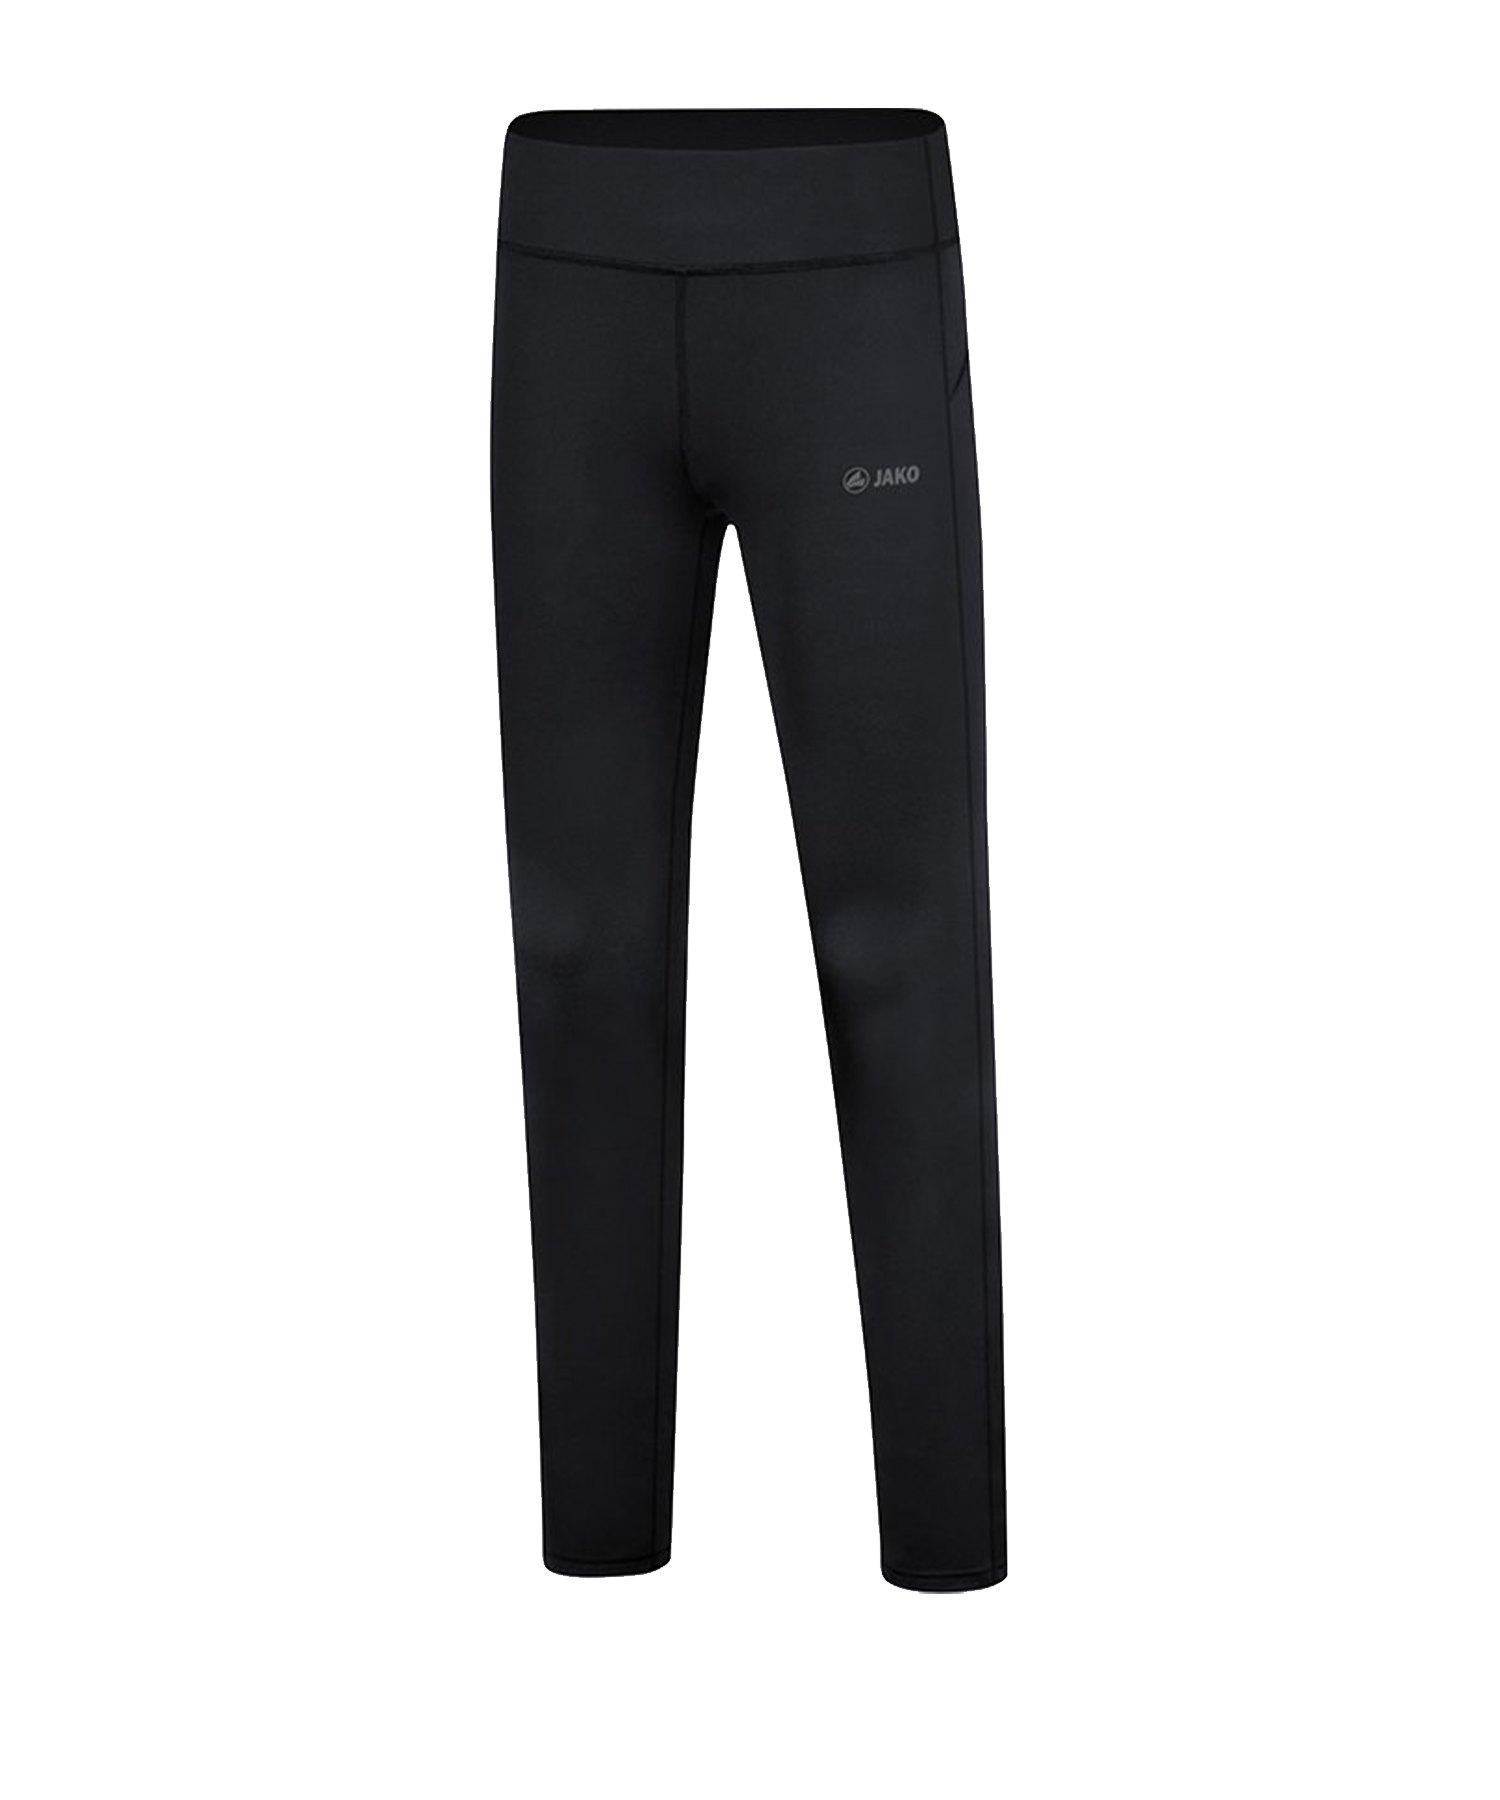 Jako Jazzpants Shape 2.0 Damen Schwarz F08 - schwarz